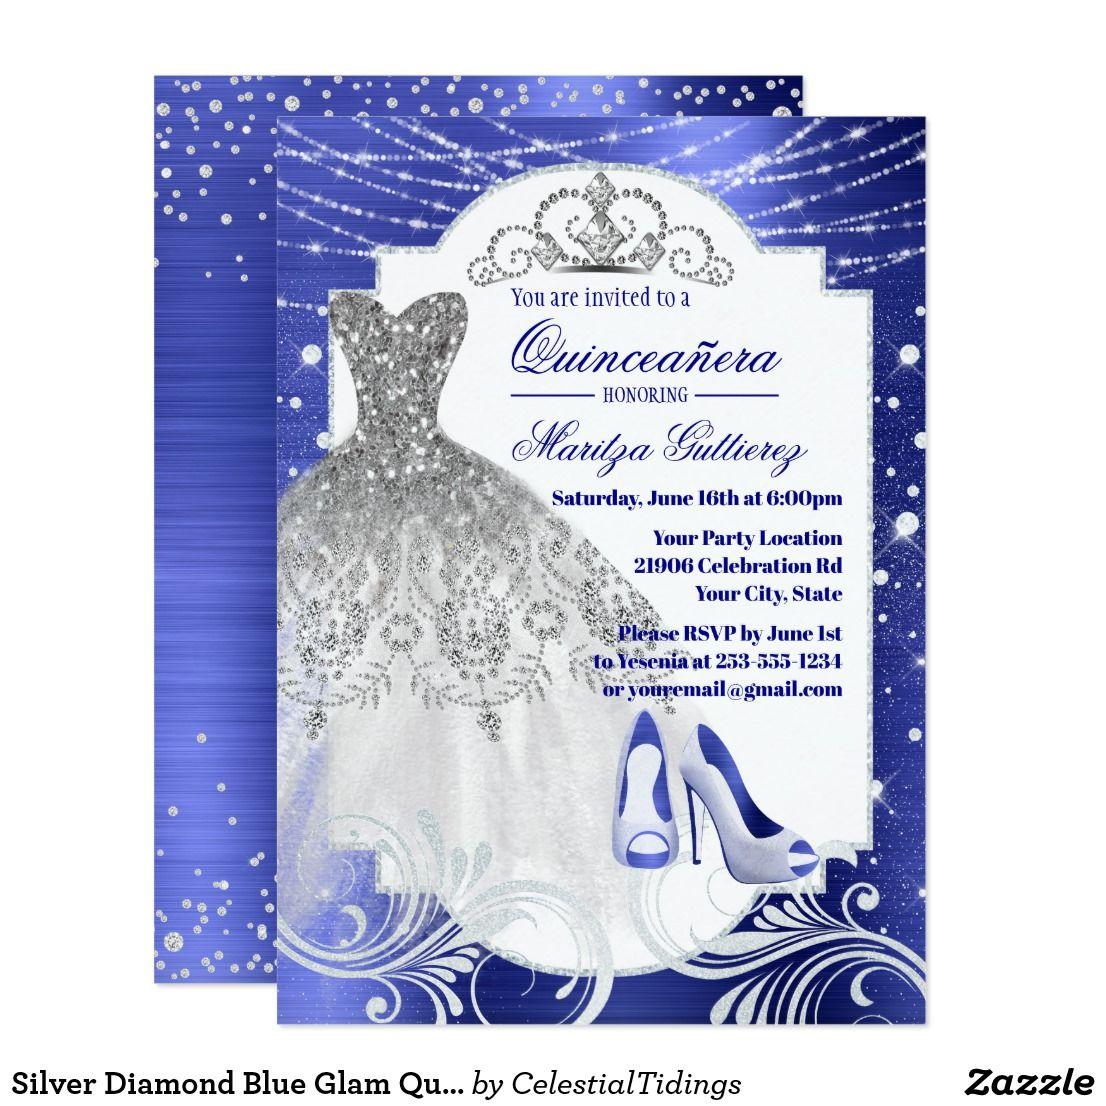 Silver Diamond Blue Glam Quinceañera Invitation This Elegant Silver Gown Diseño De Tarjeta De Invitación Invitaciones Para Quinceaños Quinceañera Invitaciones